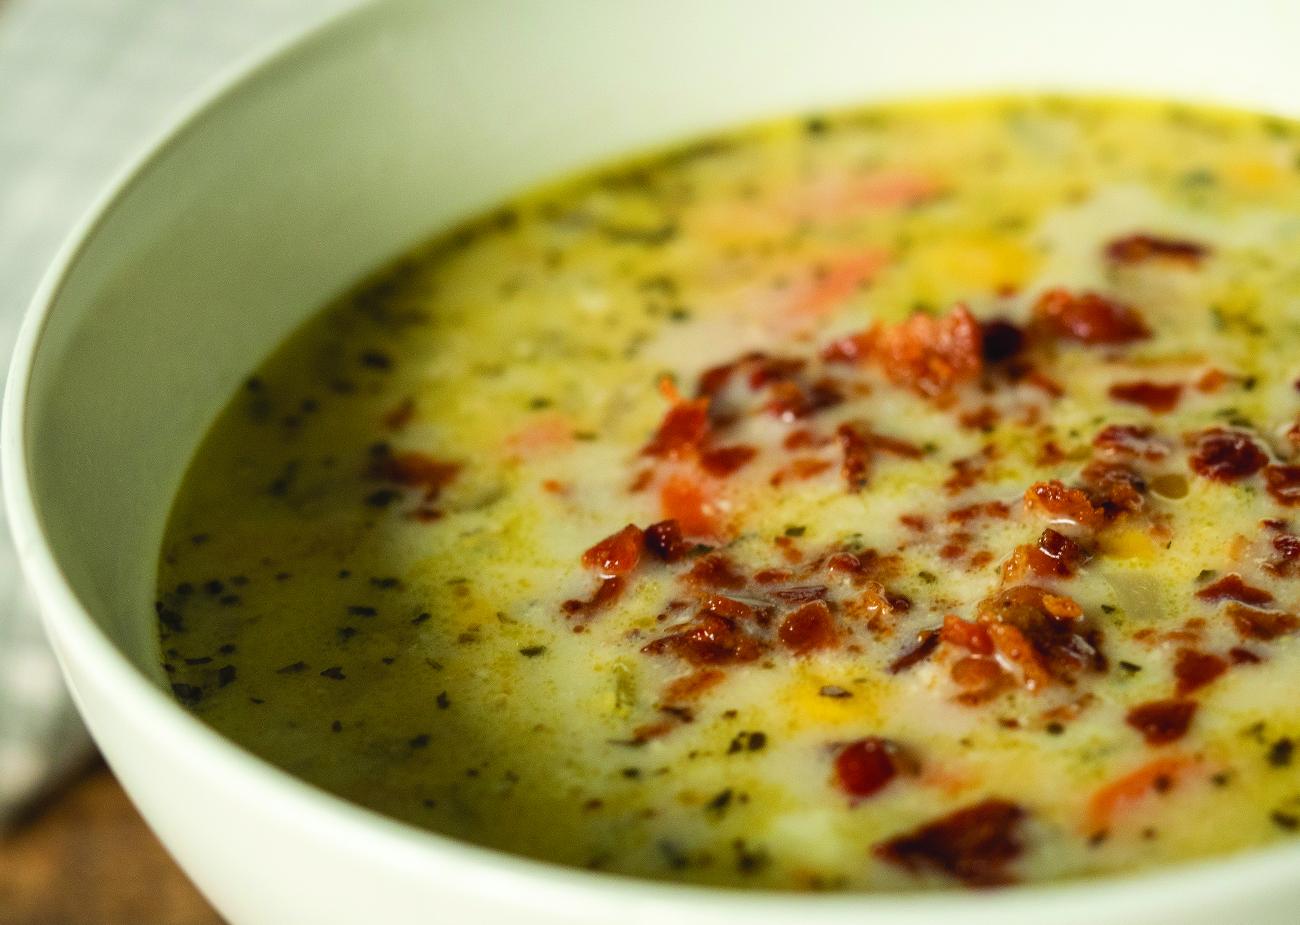 Lightened Up Slow Cooker Chicken Corn Chowder Horizontal 3